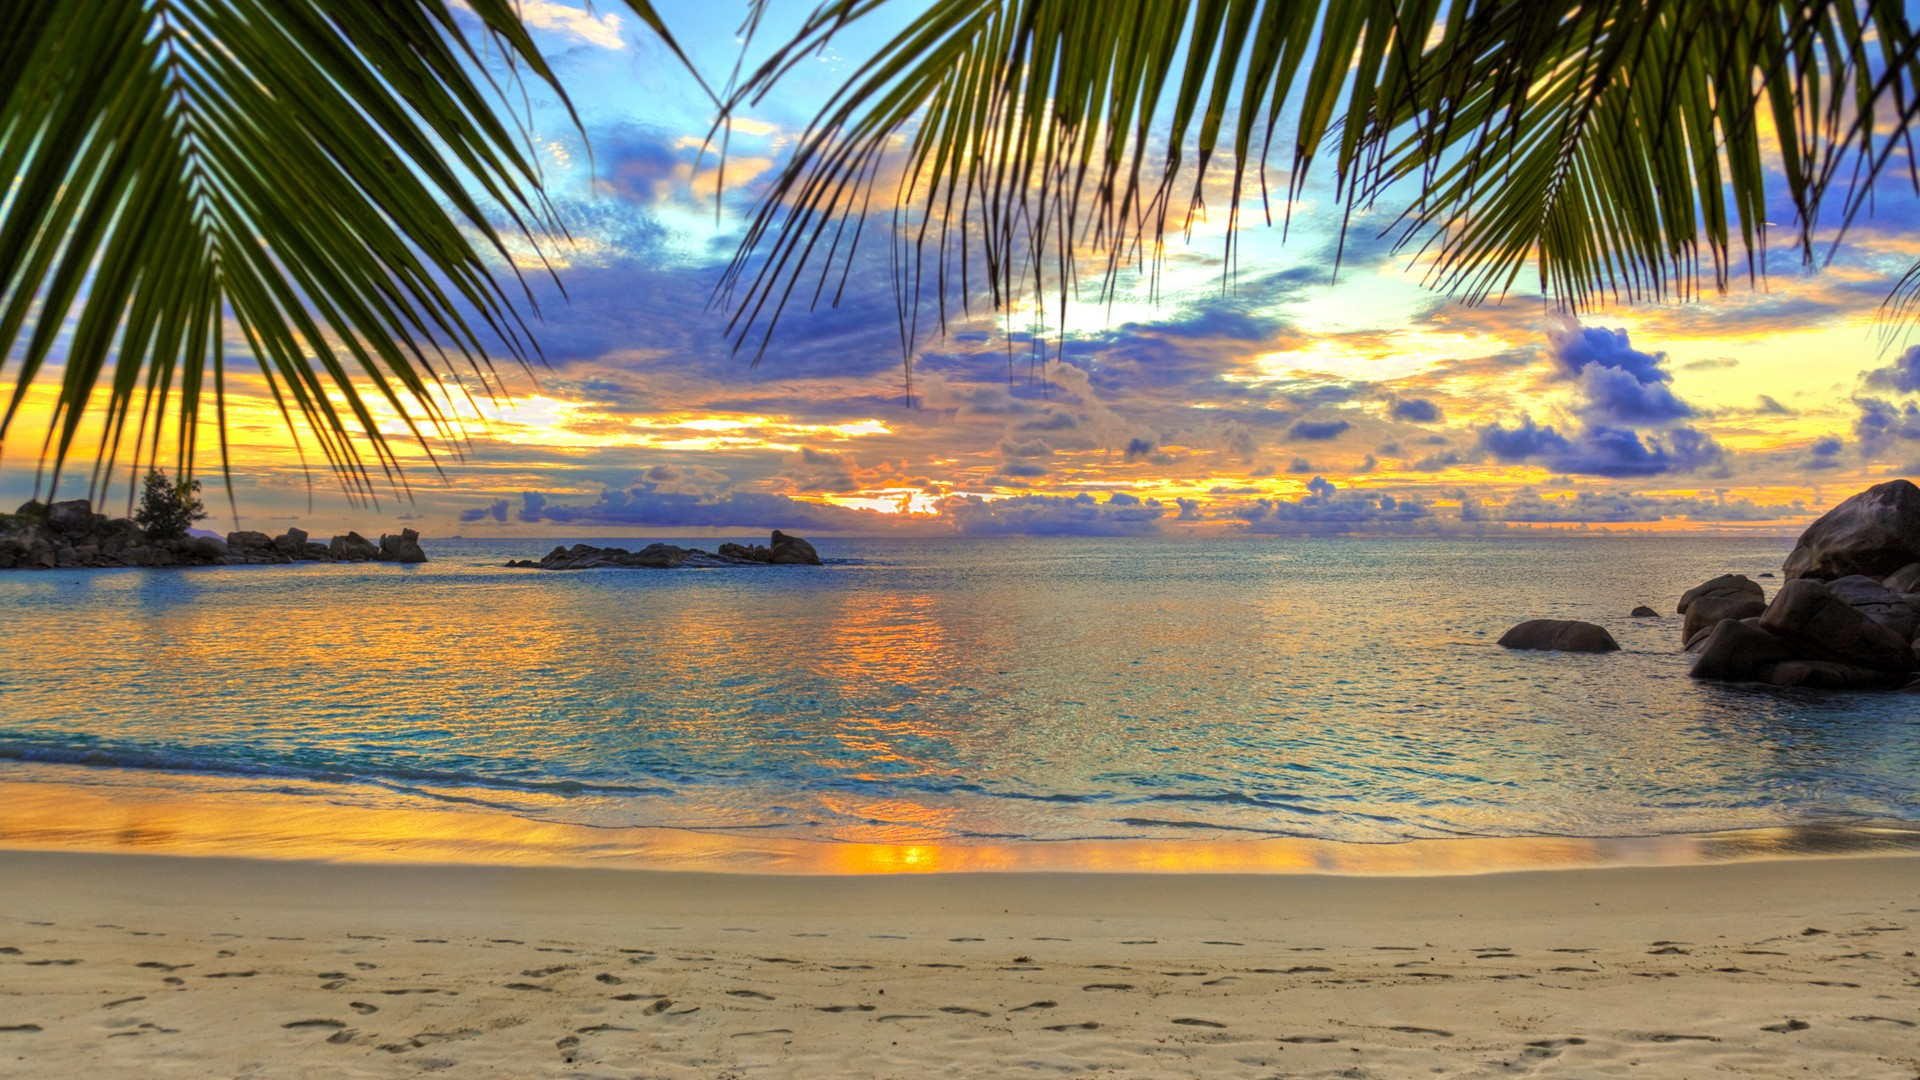 Island download wallpaper image